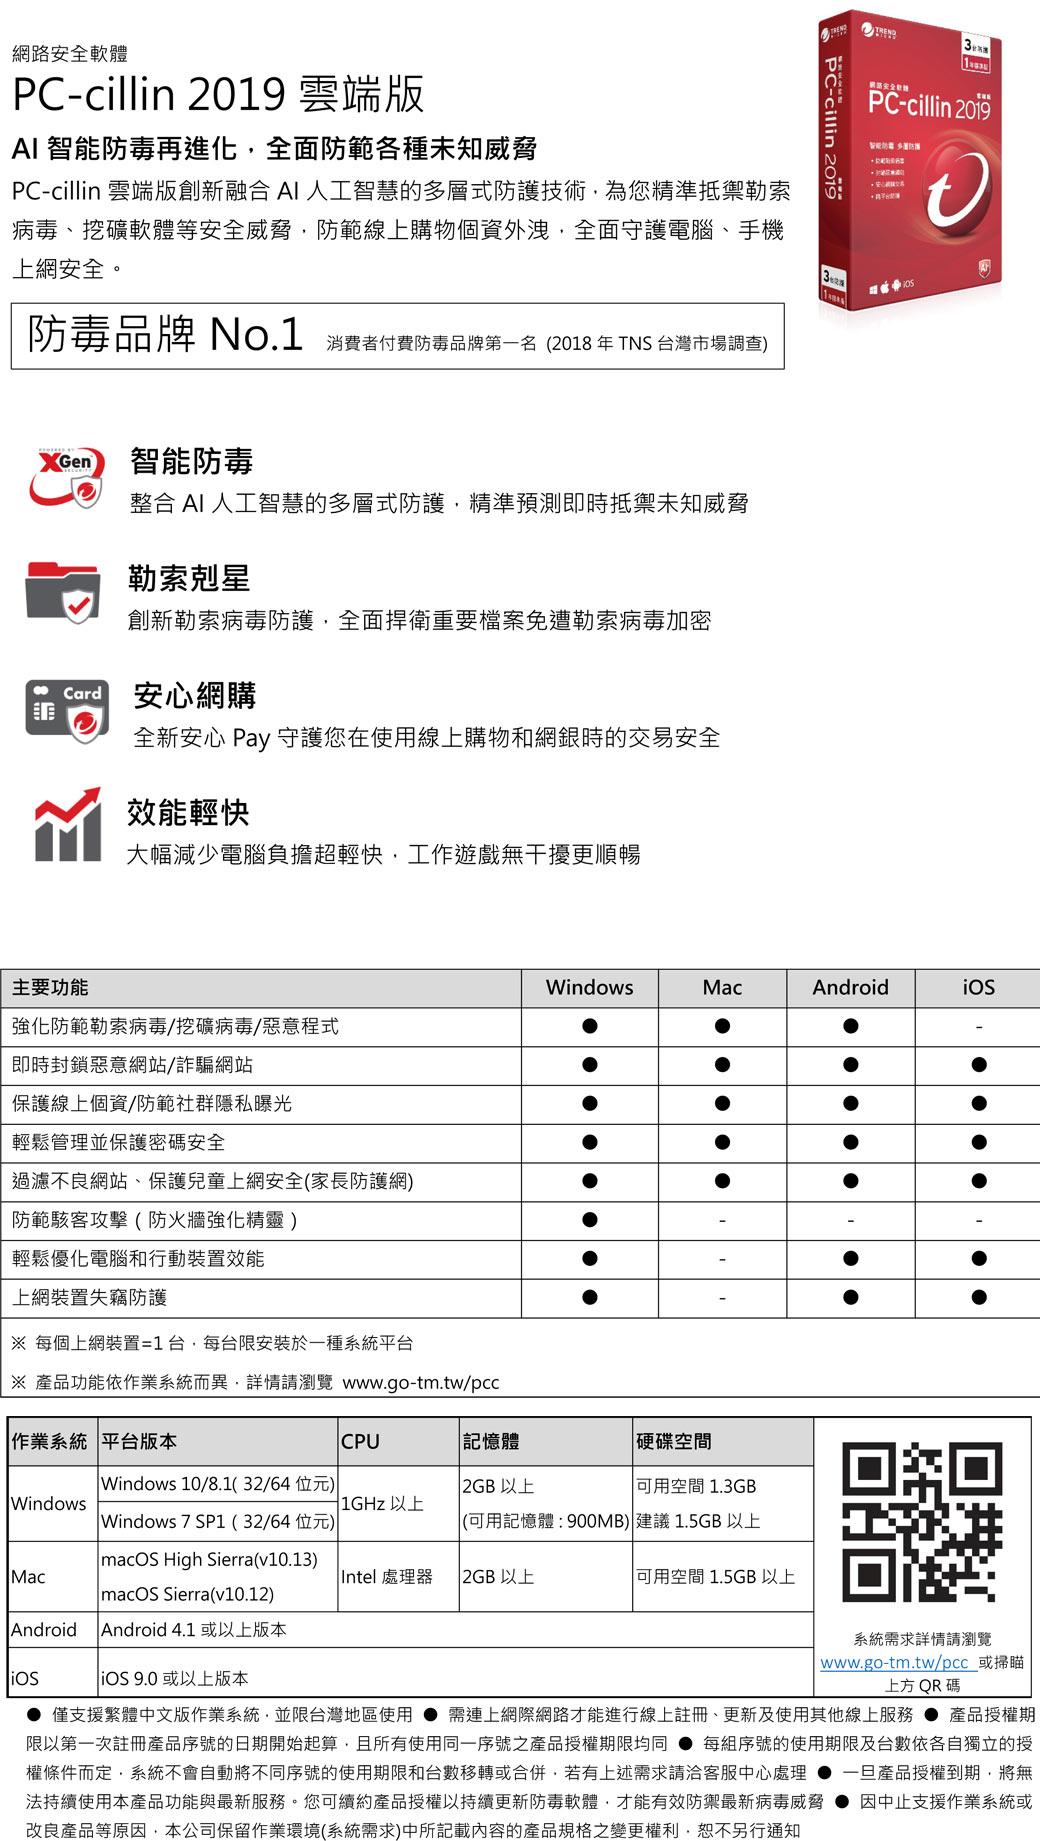 PC-cillin2019 說明.jpg